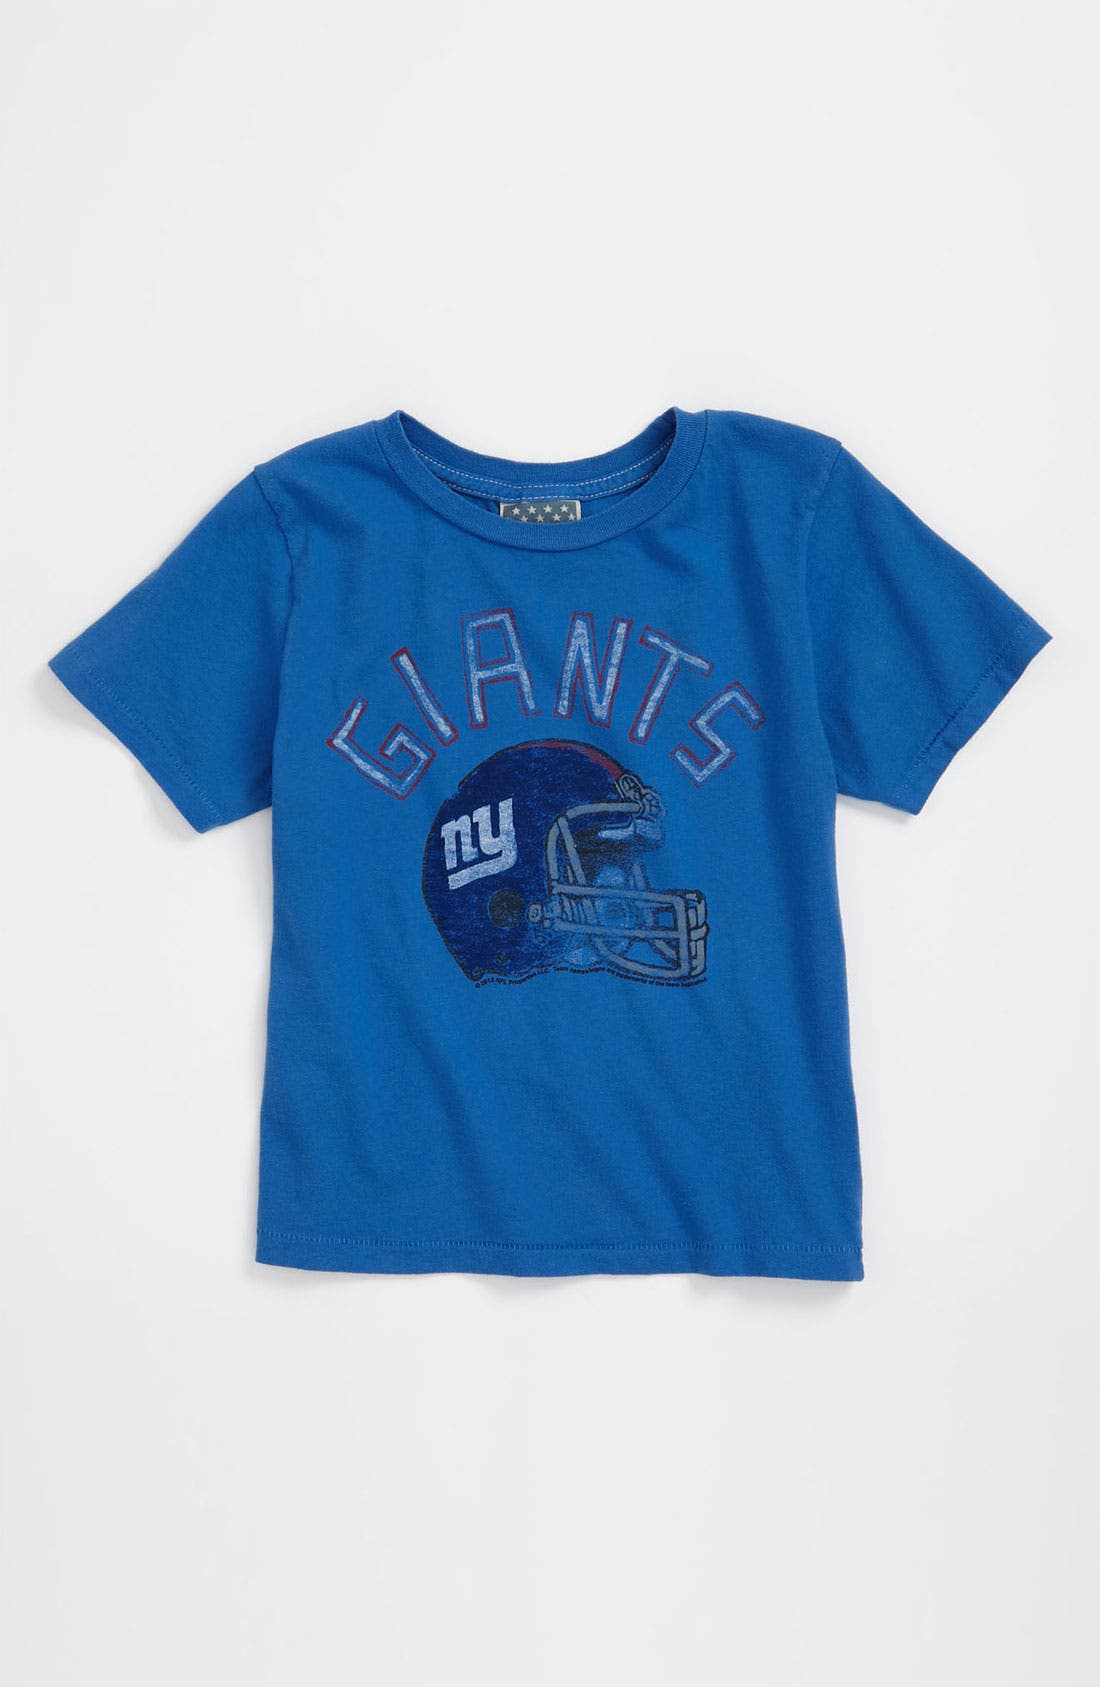 Main Image - Junk Food 'New York Giants' T-Shirt (Infant)